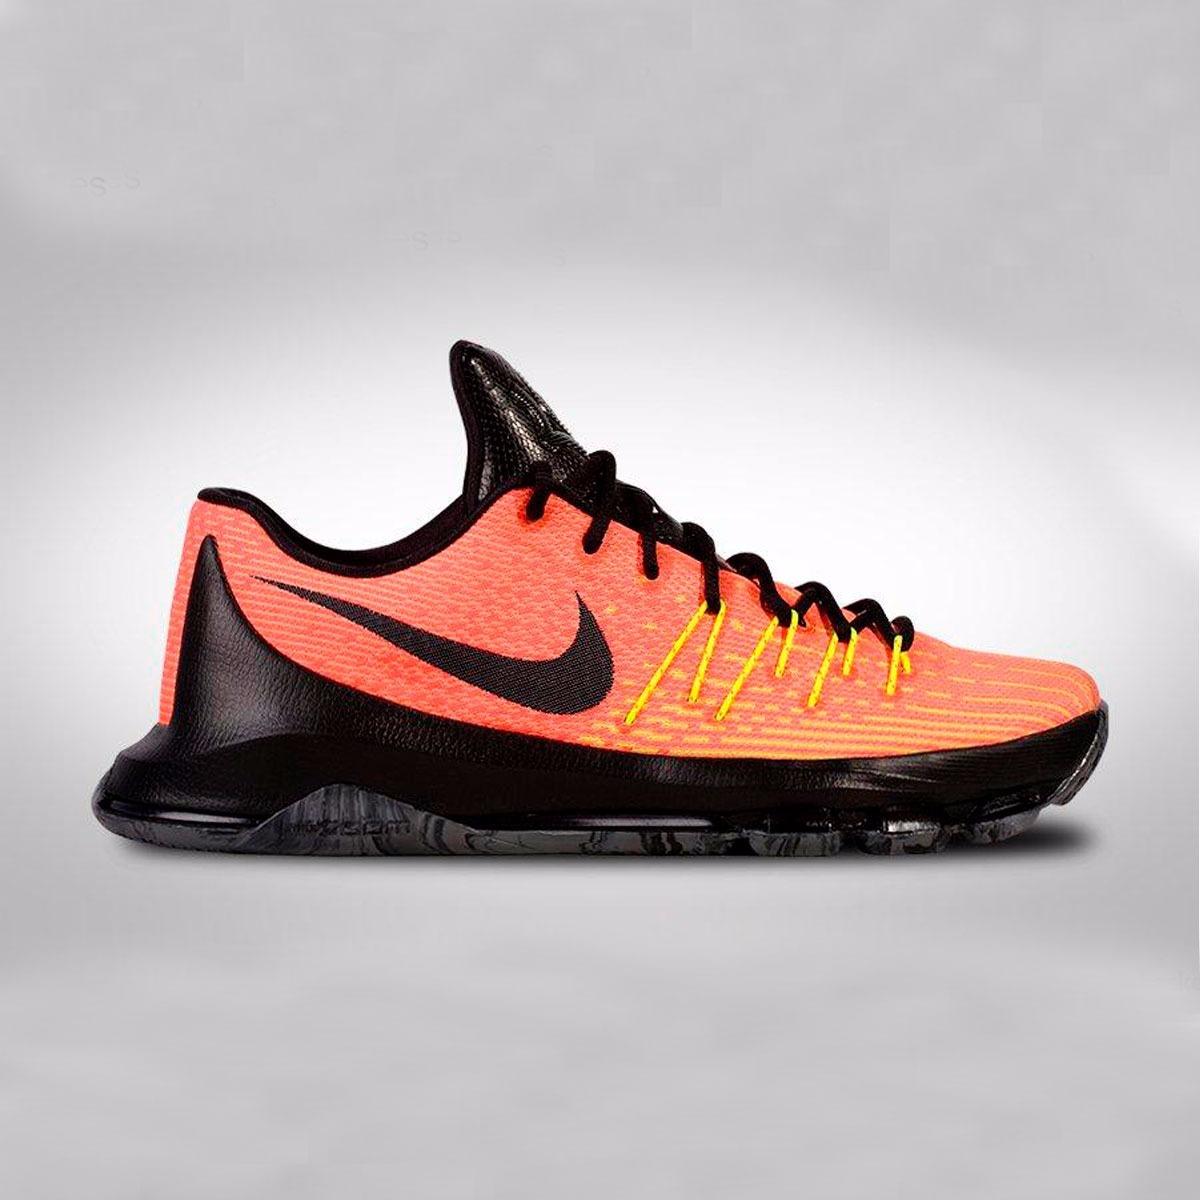 premium selection 5874f 44140 Zapatillas Nike Kd 8 Hunt s Hill Salida Del Sol Us 9 - S  420,00 en ...